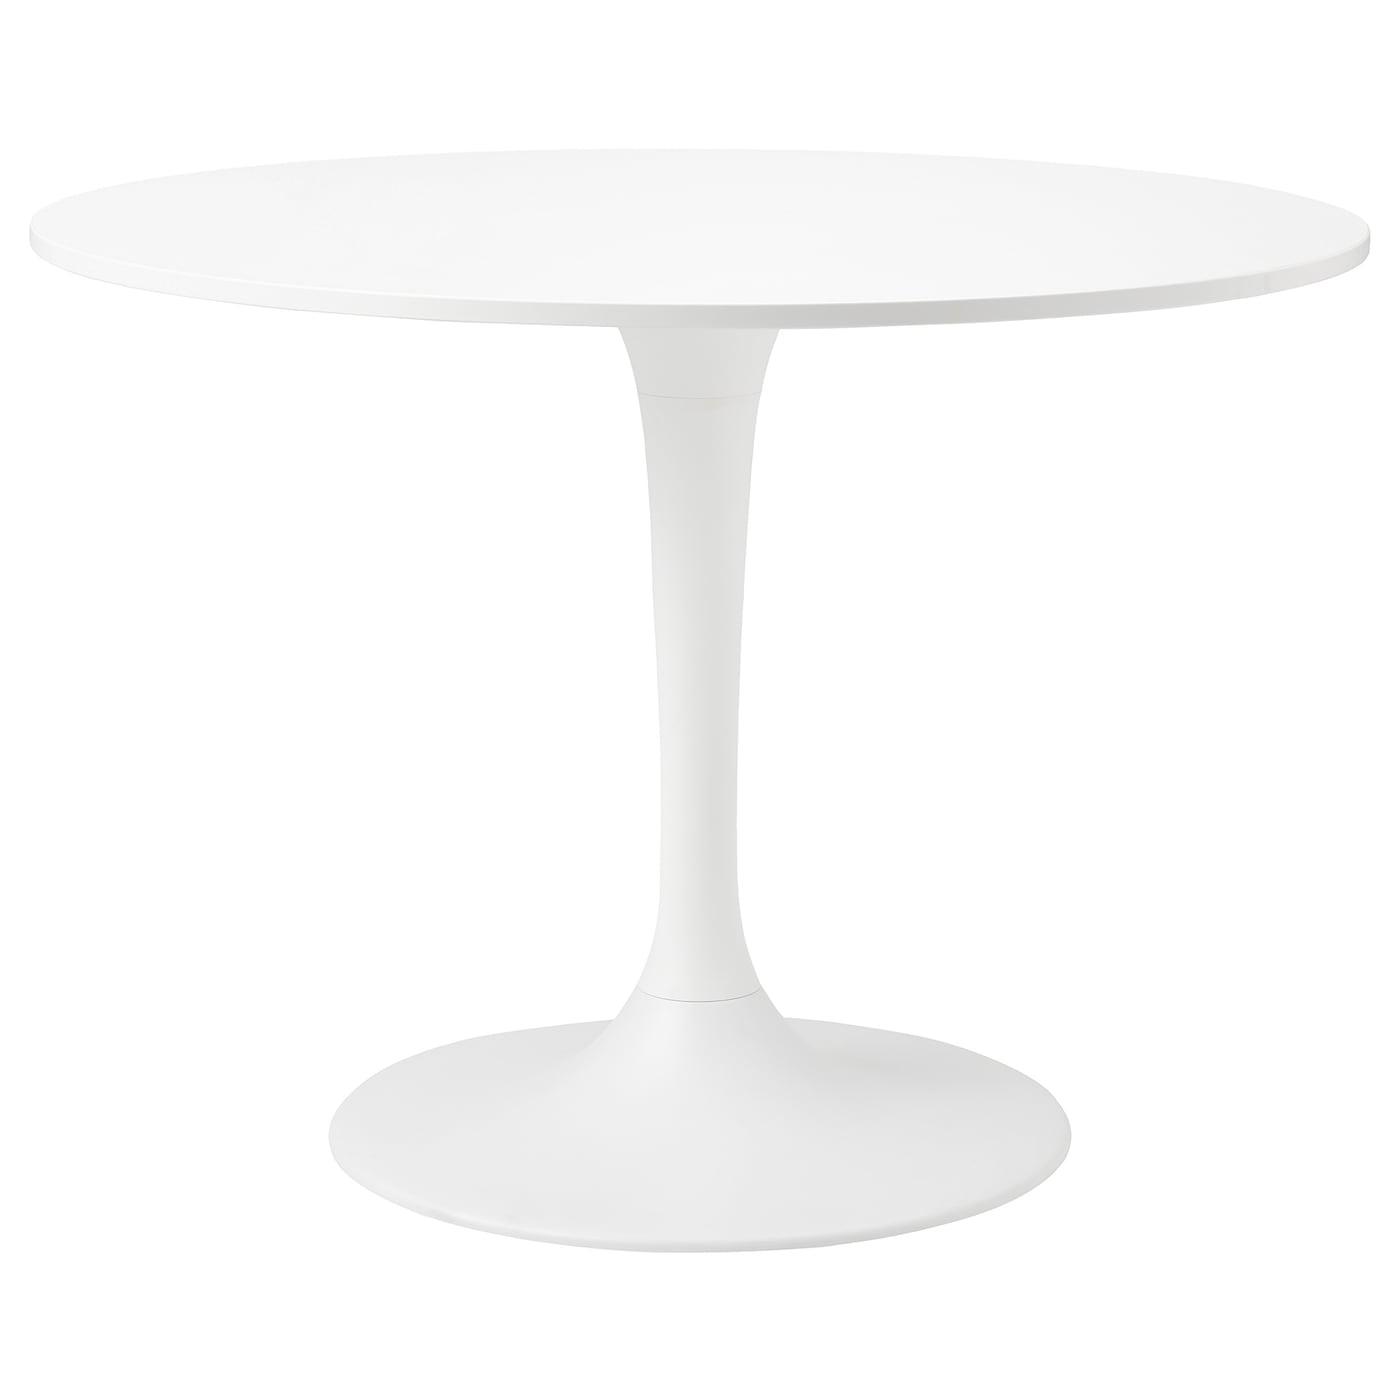 docksta table white white 40 1 2 103 cm